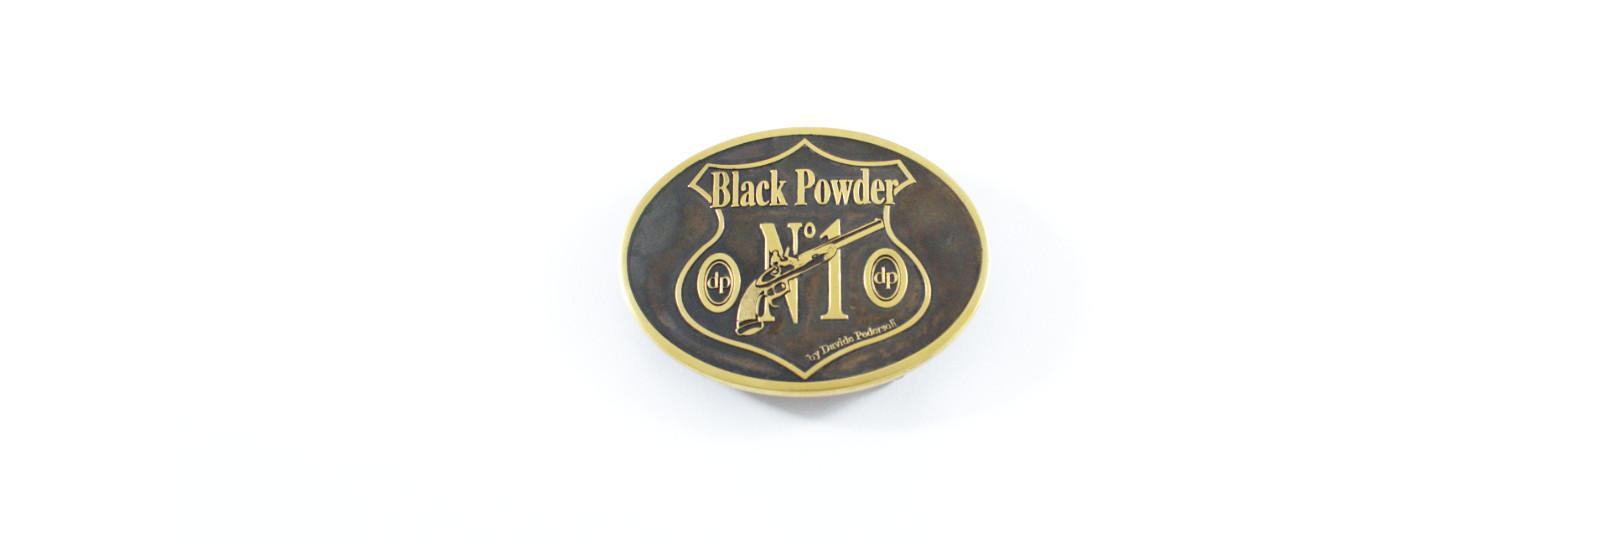 "Fibbia ottone bronzato ""black powder n 1"""